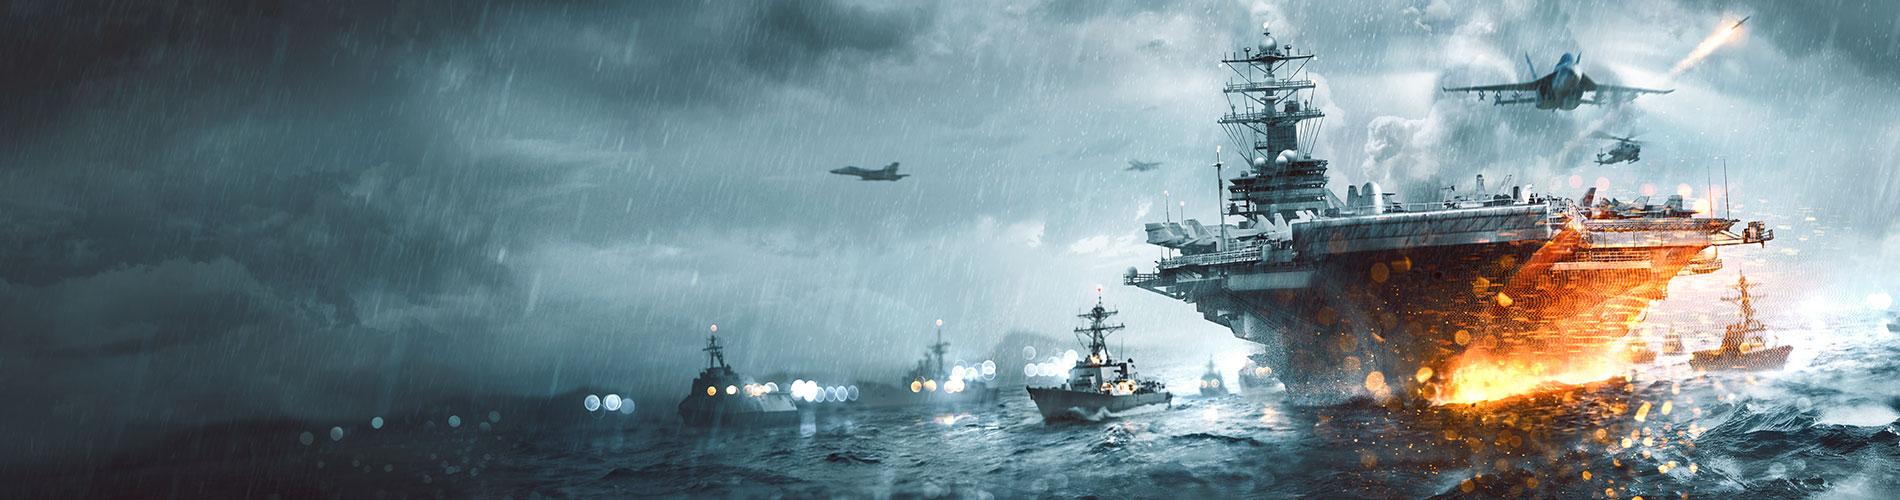 Battlefield-4-Naval-Strike-News-3